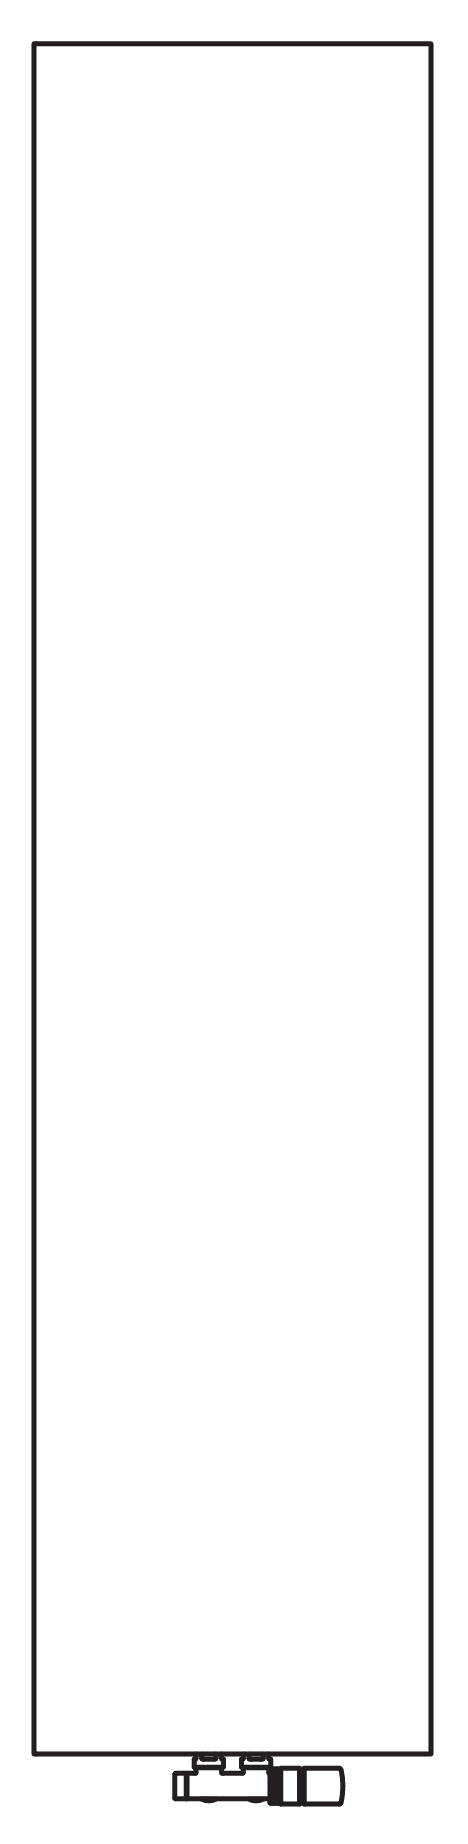 1810x420